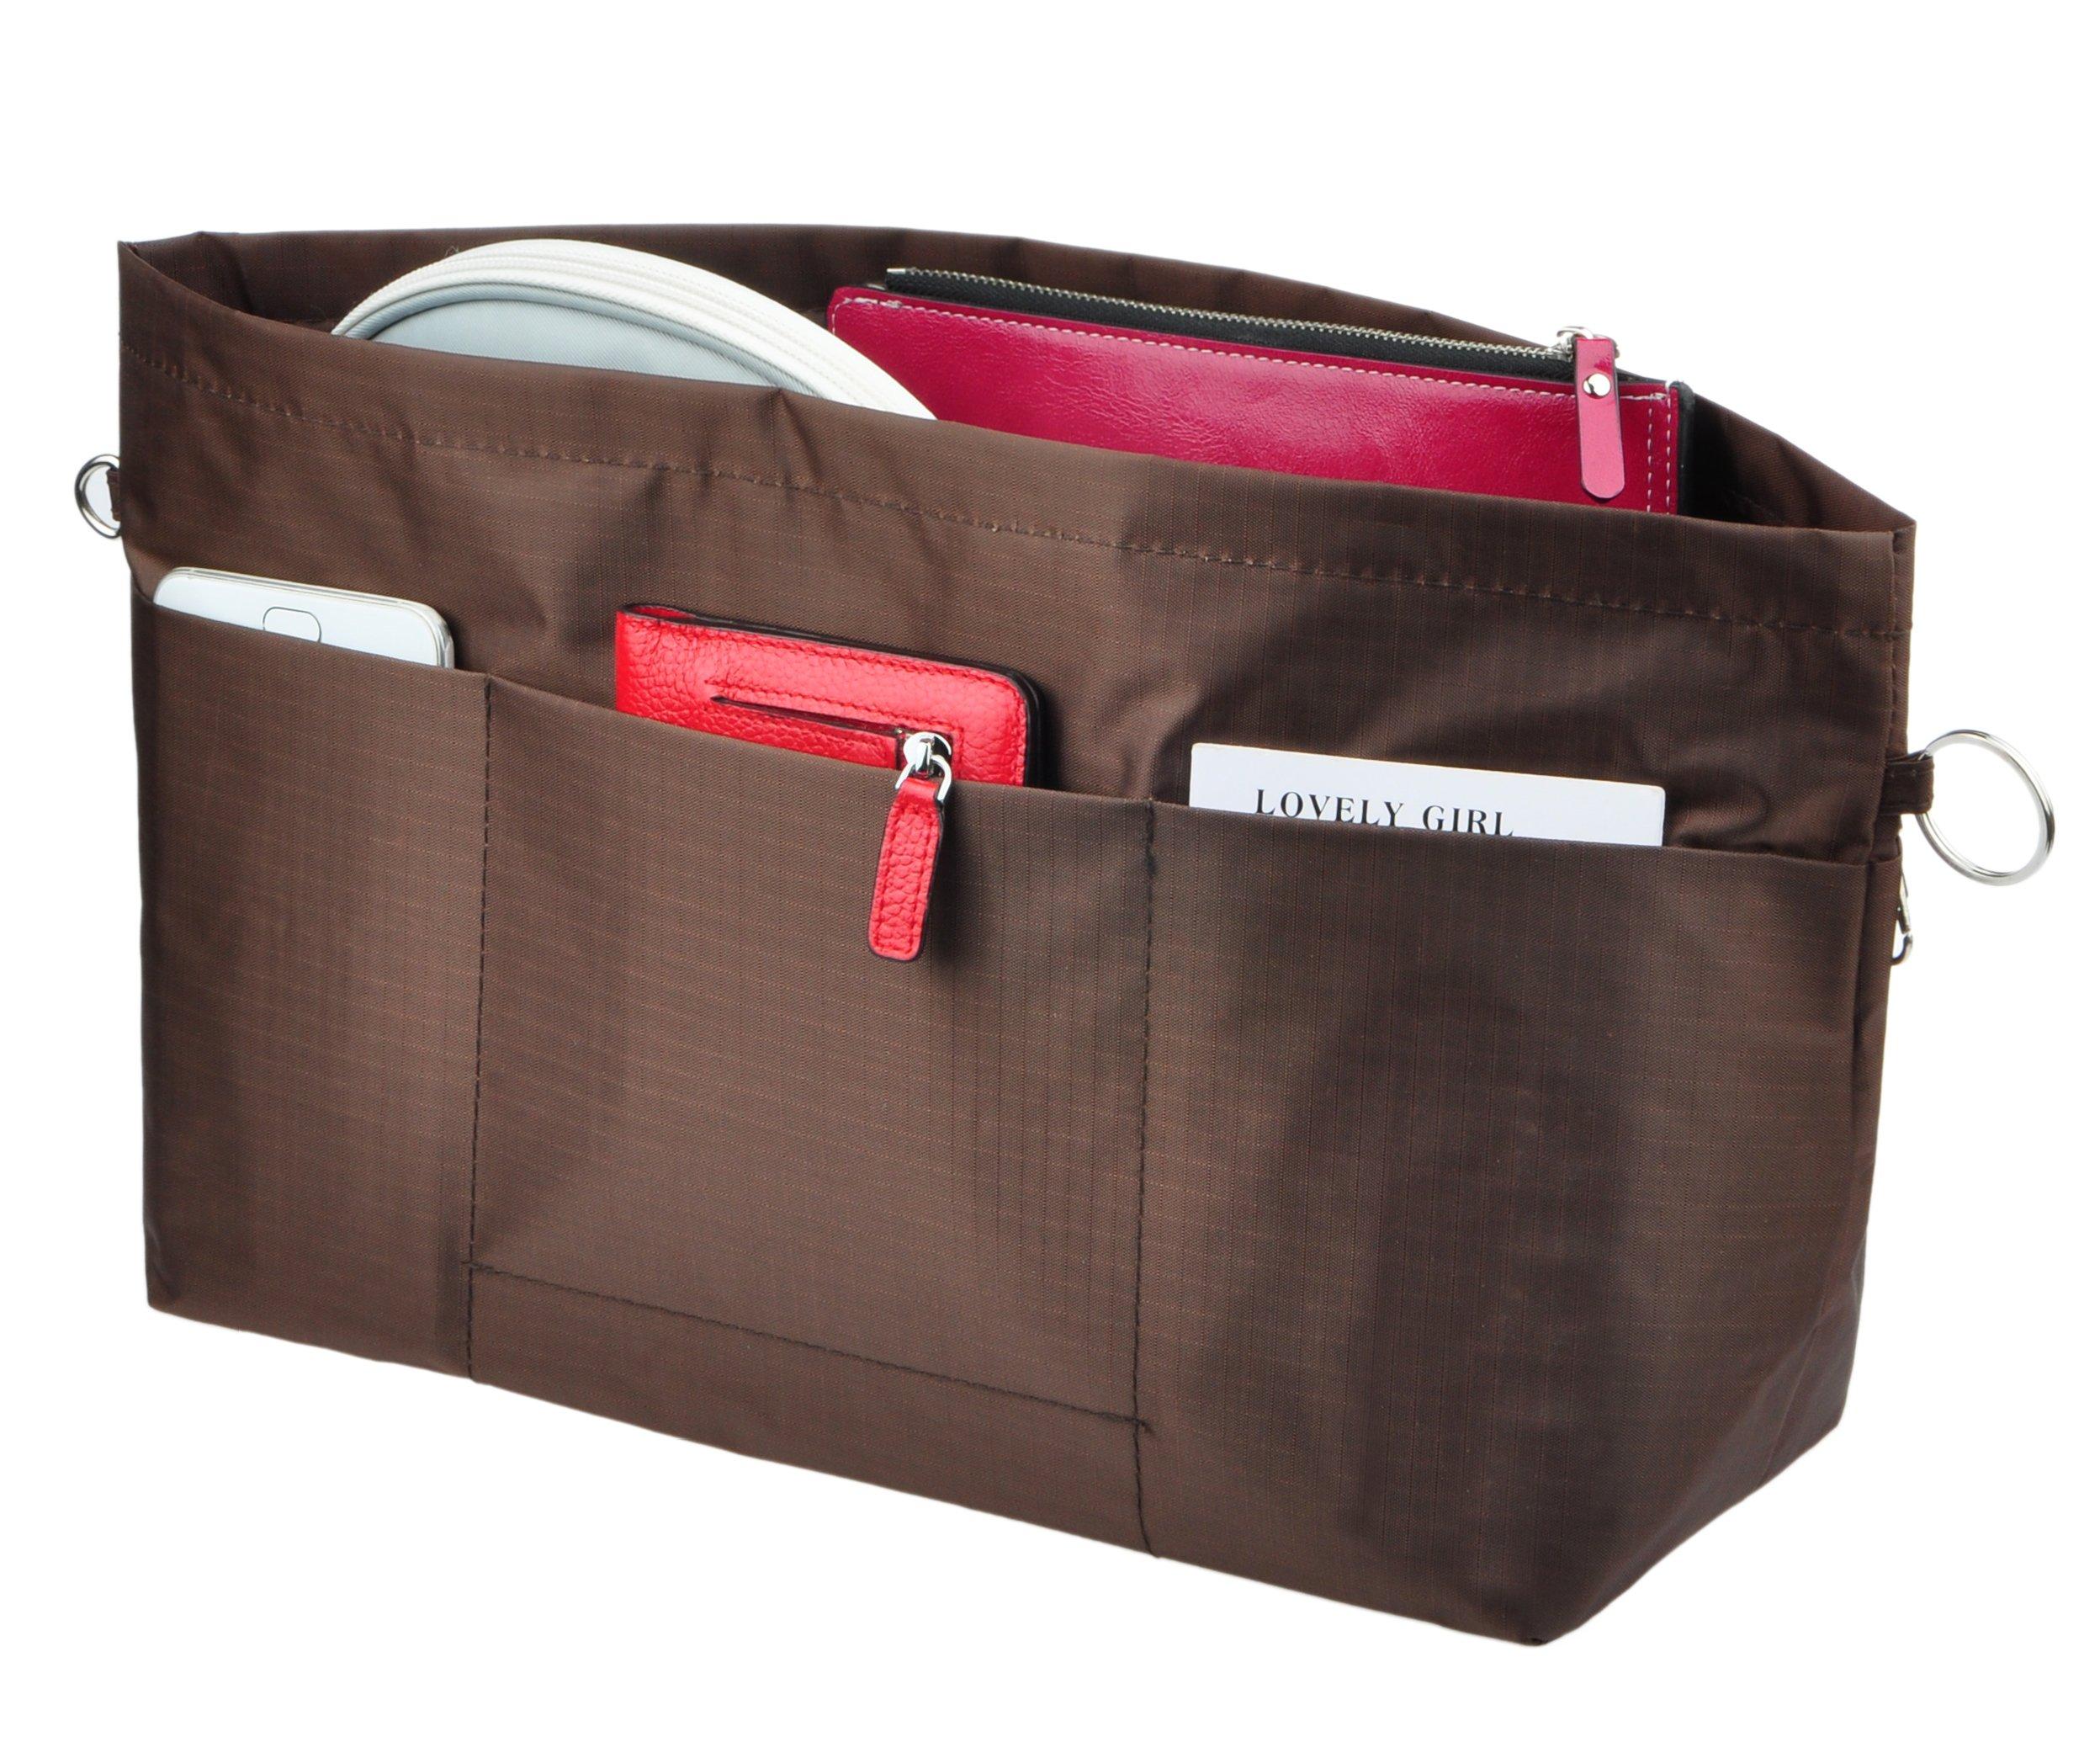 Vercord Handbag Purse Tote Pocketbook Organizer Insert Zipper Clousure 11 Pockets, Coffee M